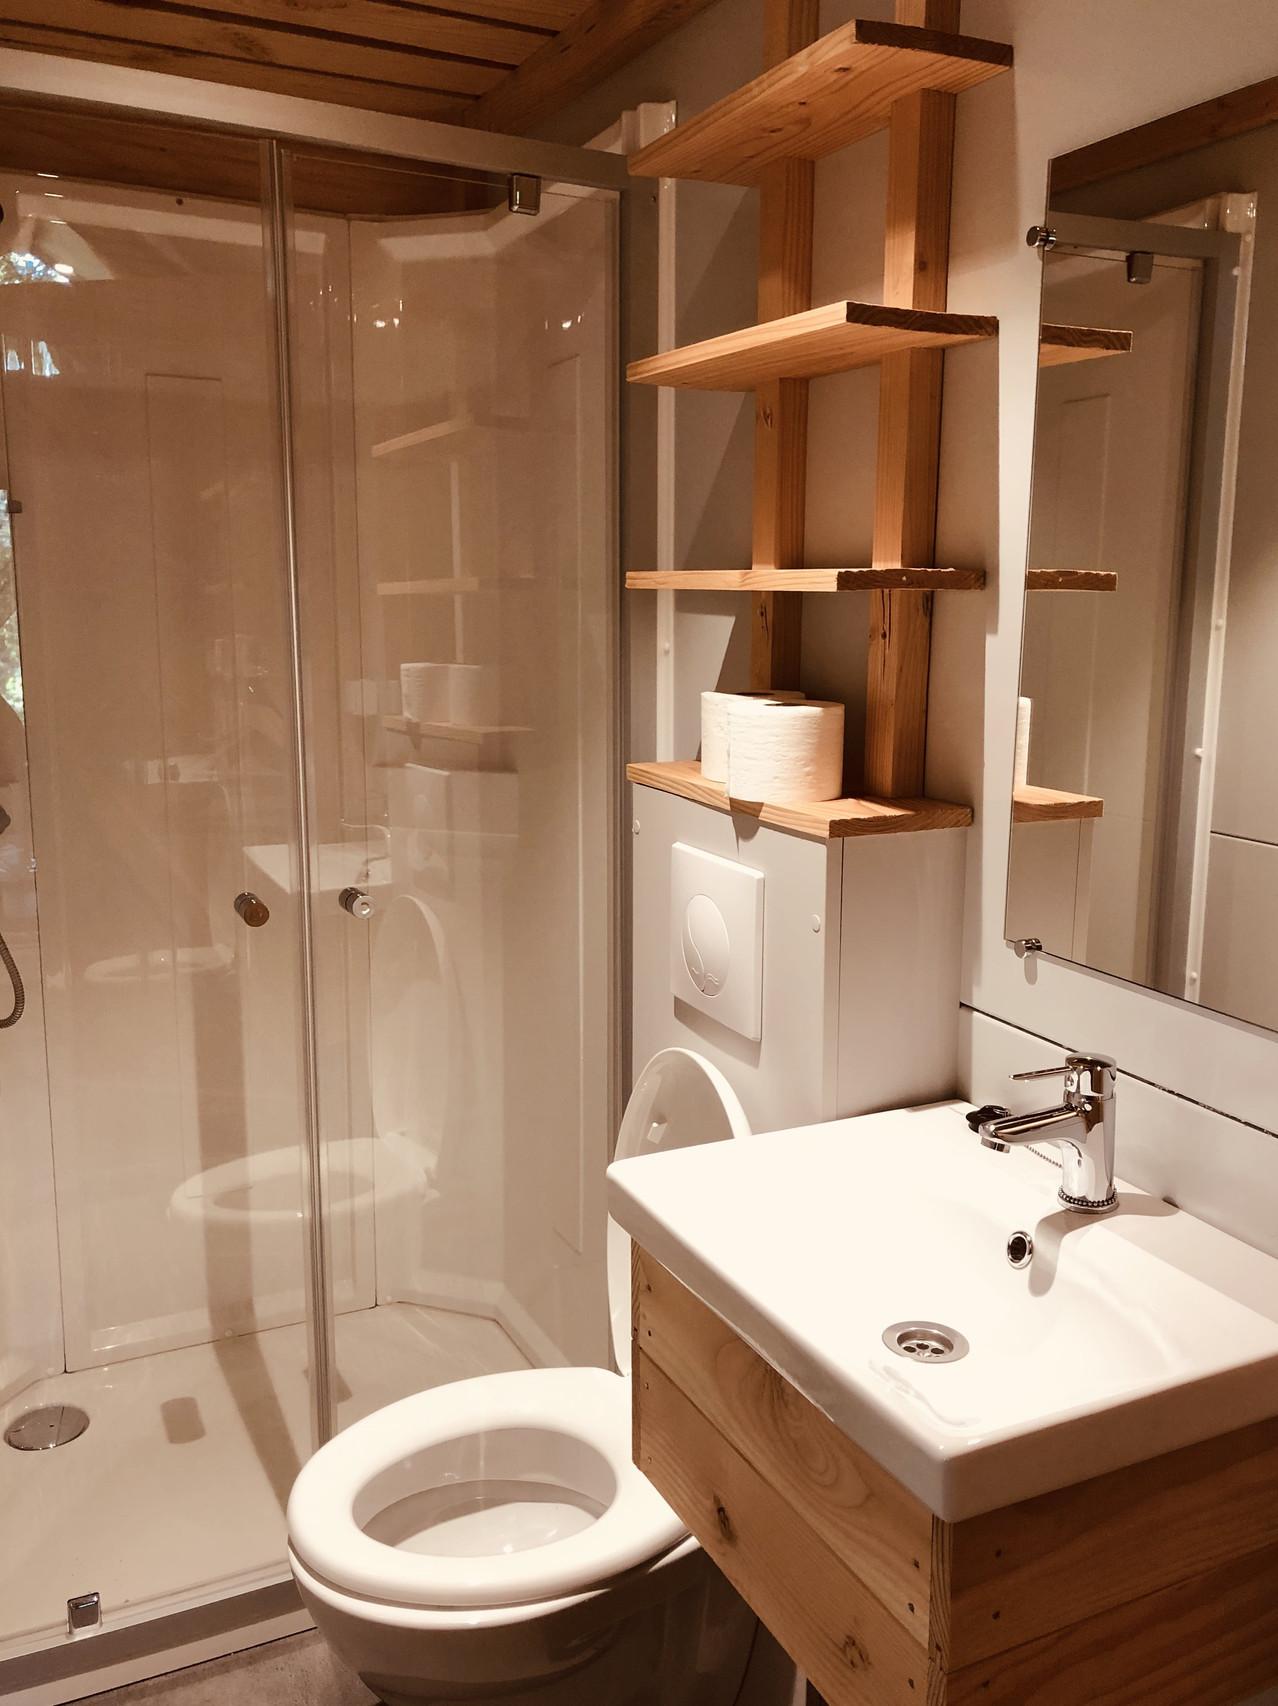 Huttopia Camping de Roos Trappeur bathroom - the Netherlands